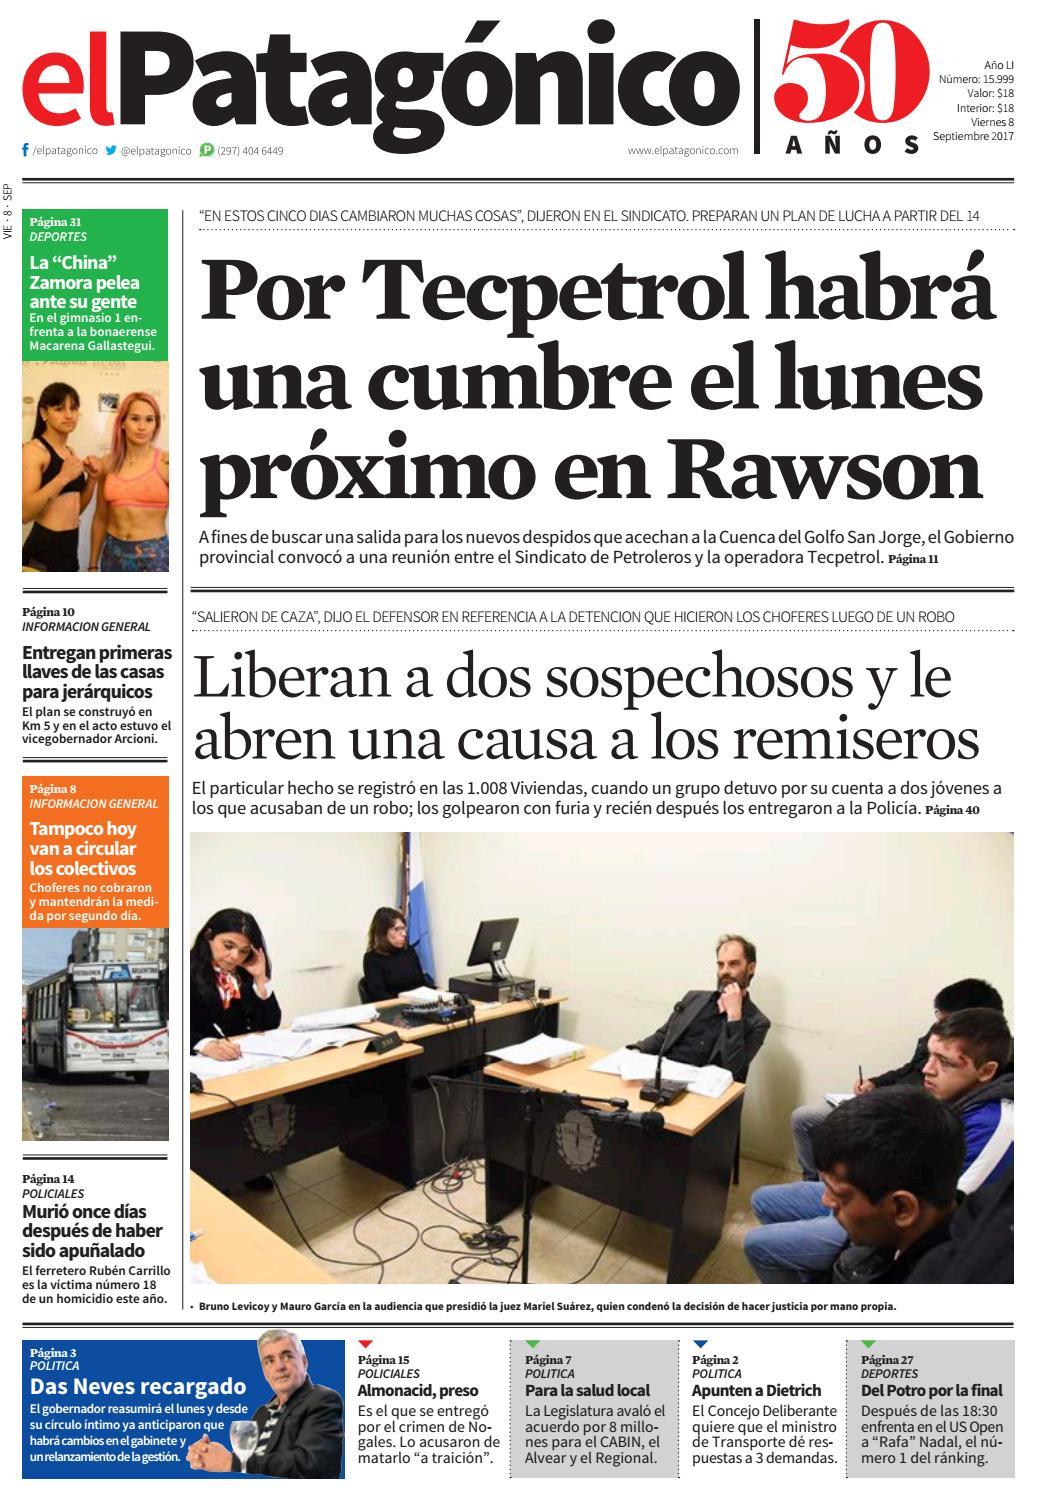 edicion001508092017.pdf by El Patagonico - issuu